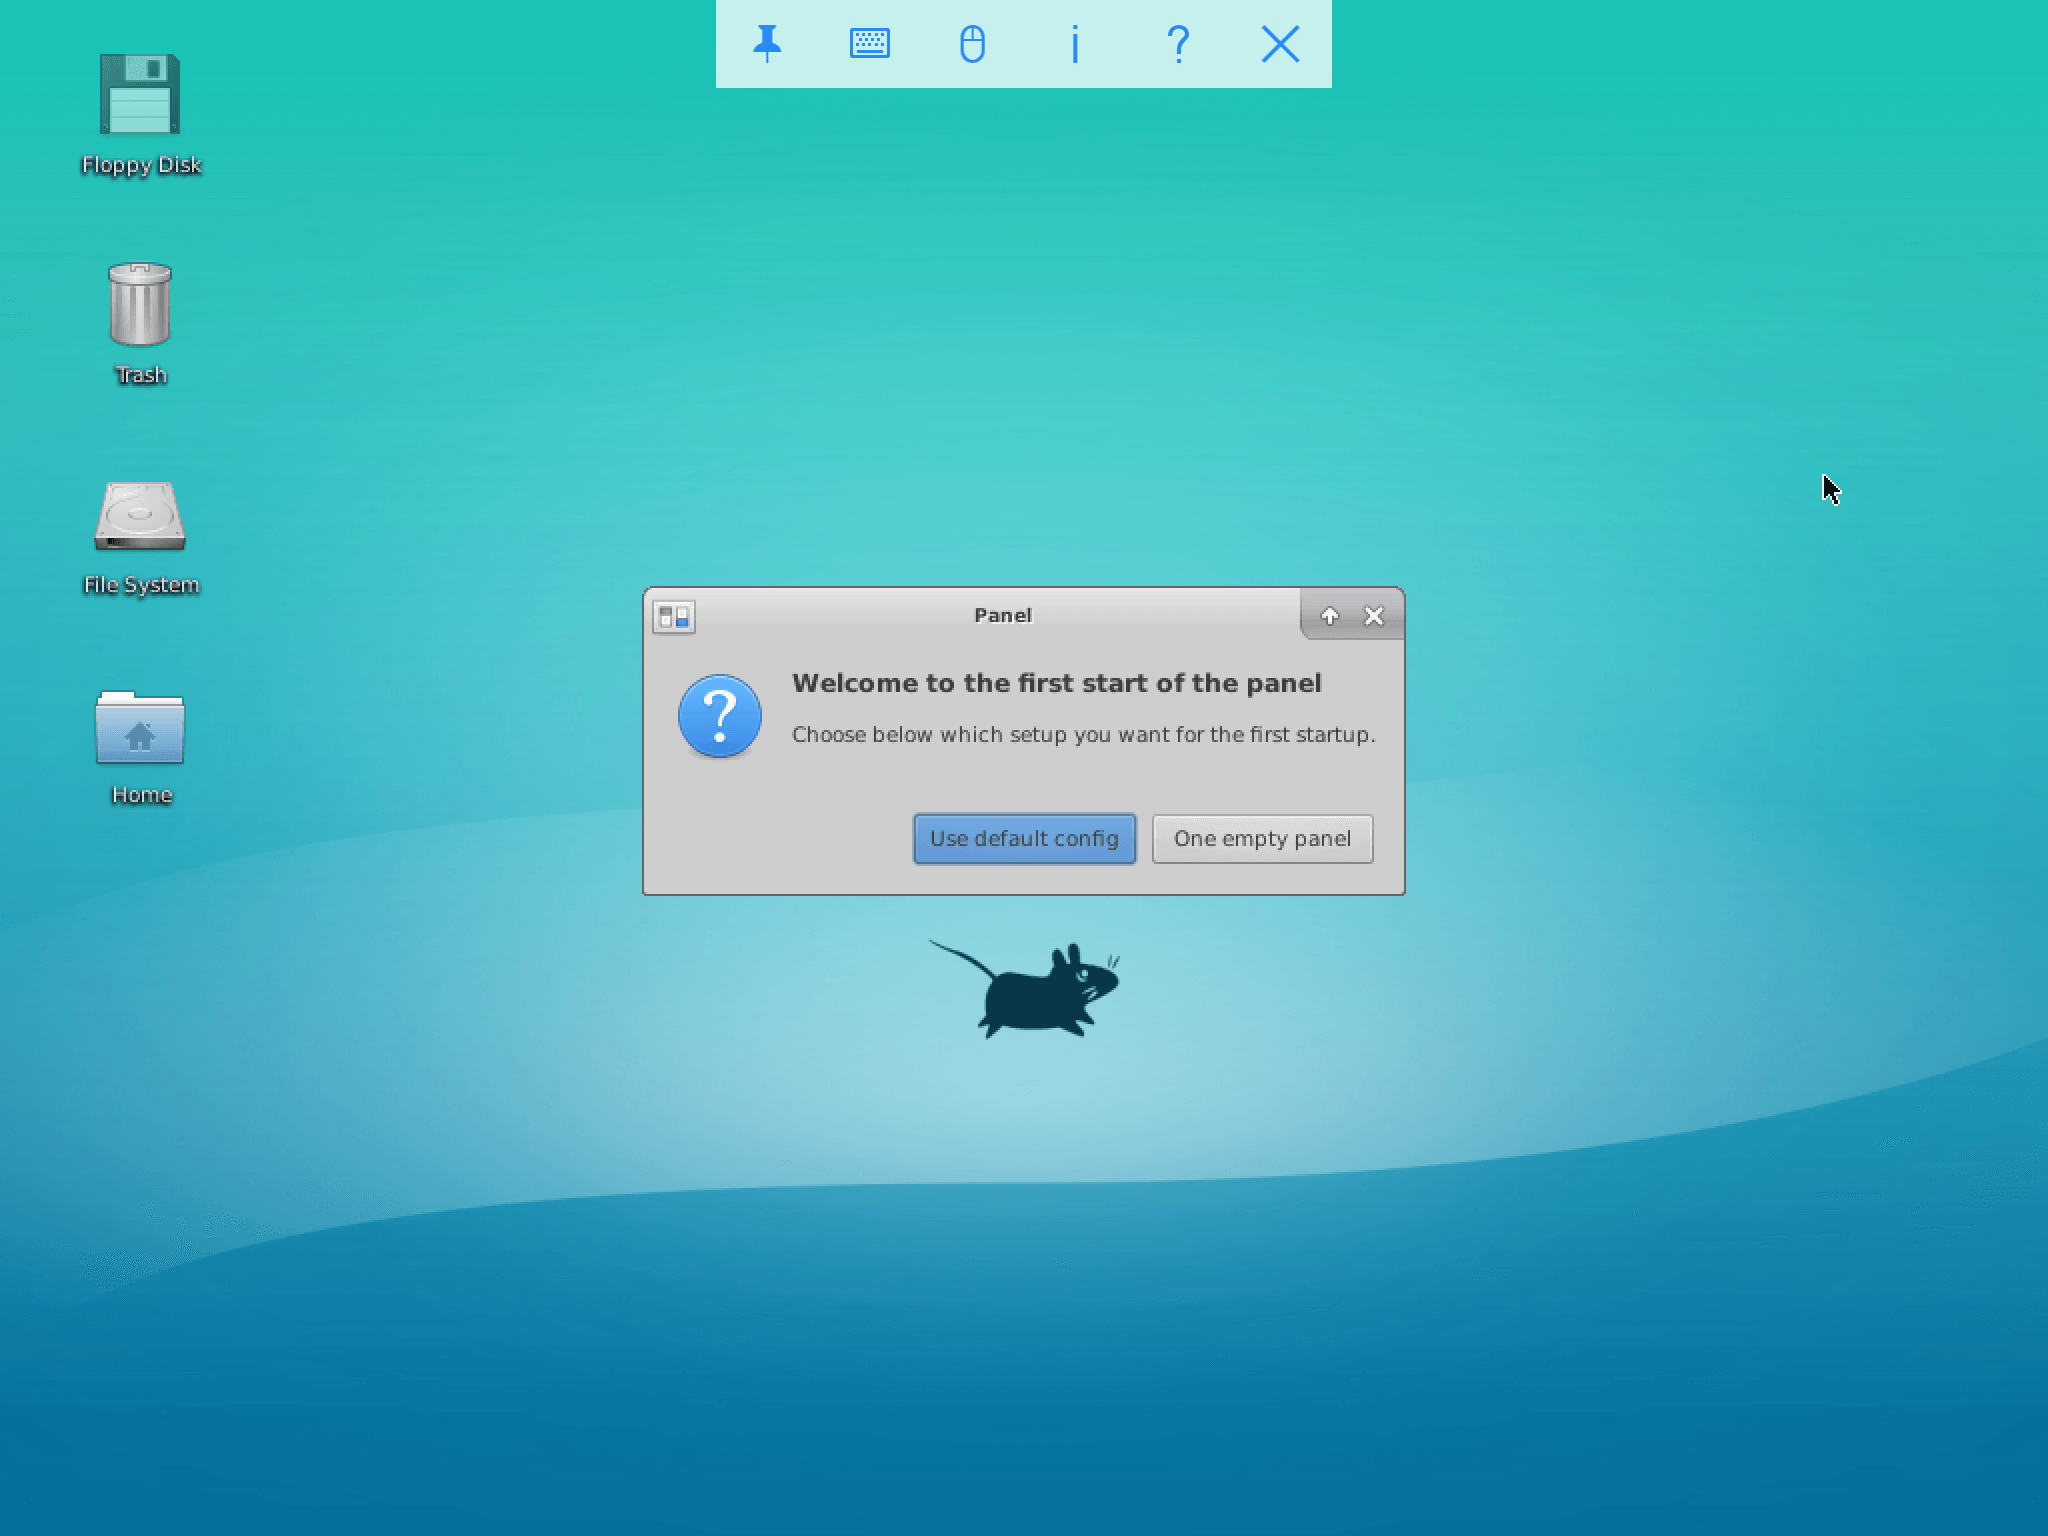 VPS на Linux с графическим интерфейсом: запускаем сервер VNC на Ubuntu 18.04 - 5